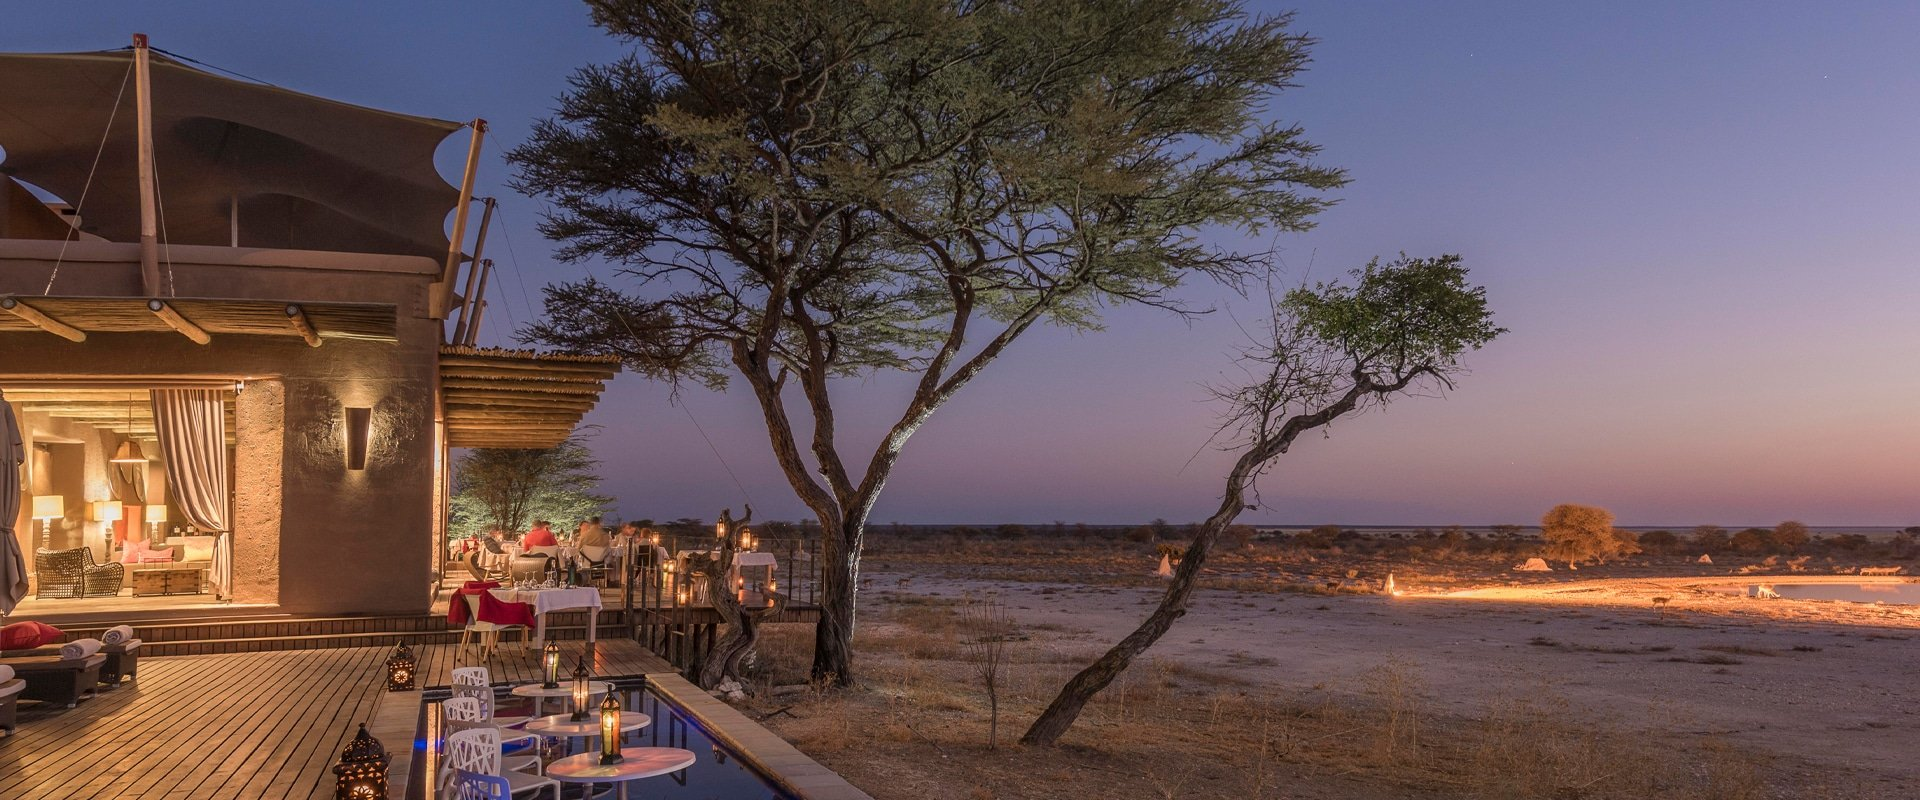 Eat dinner under a starry Namibian sky